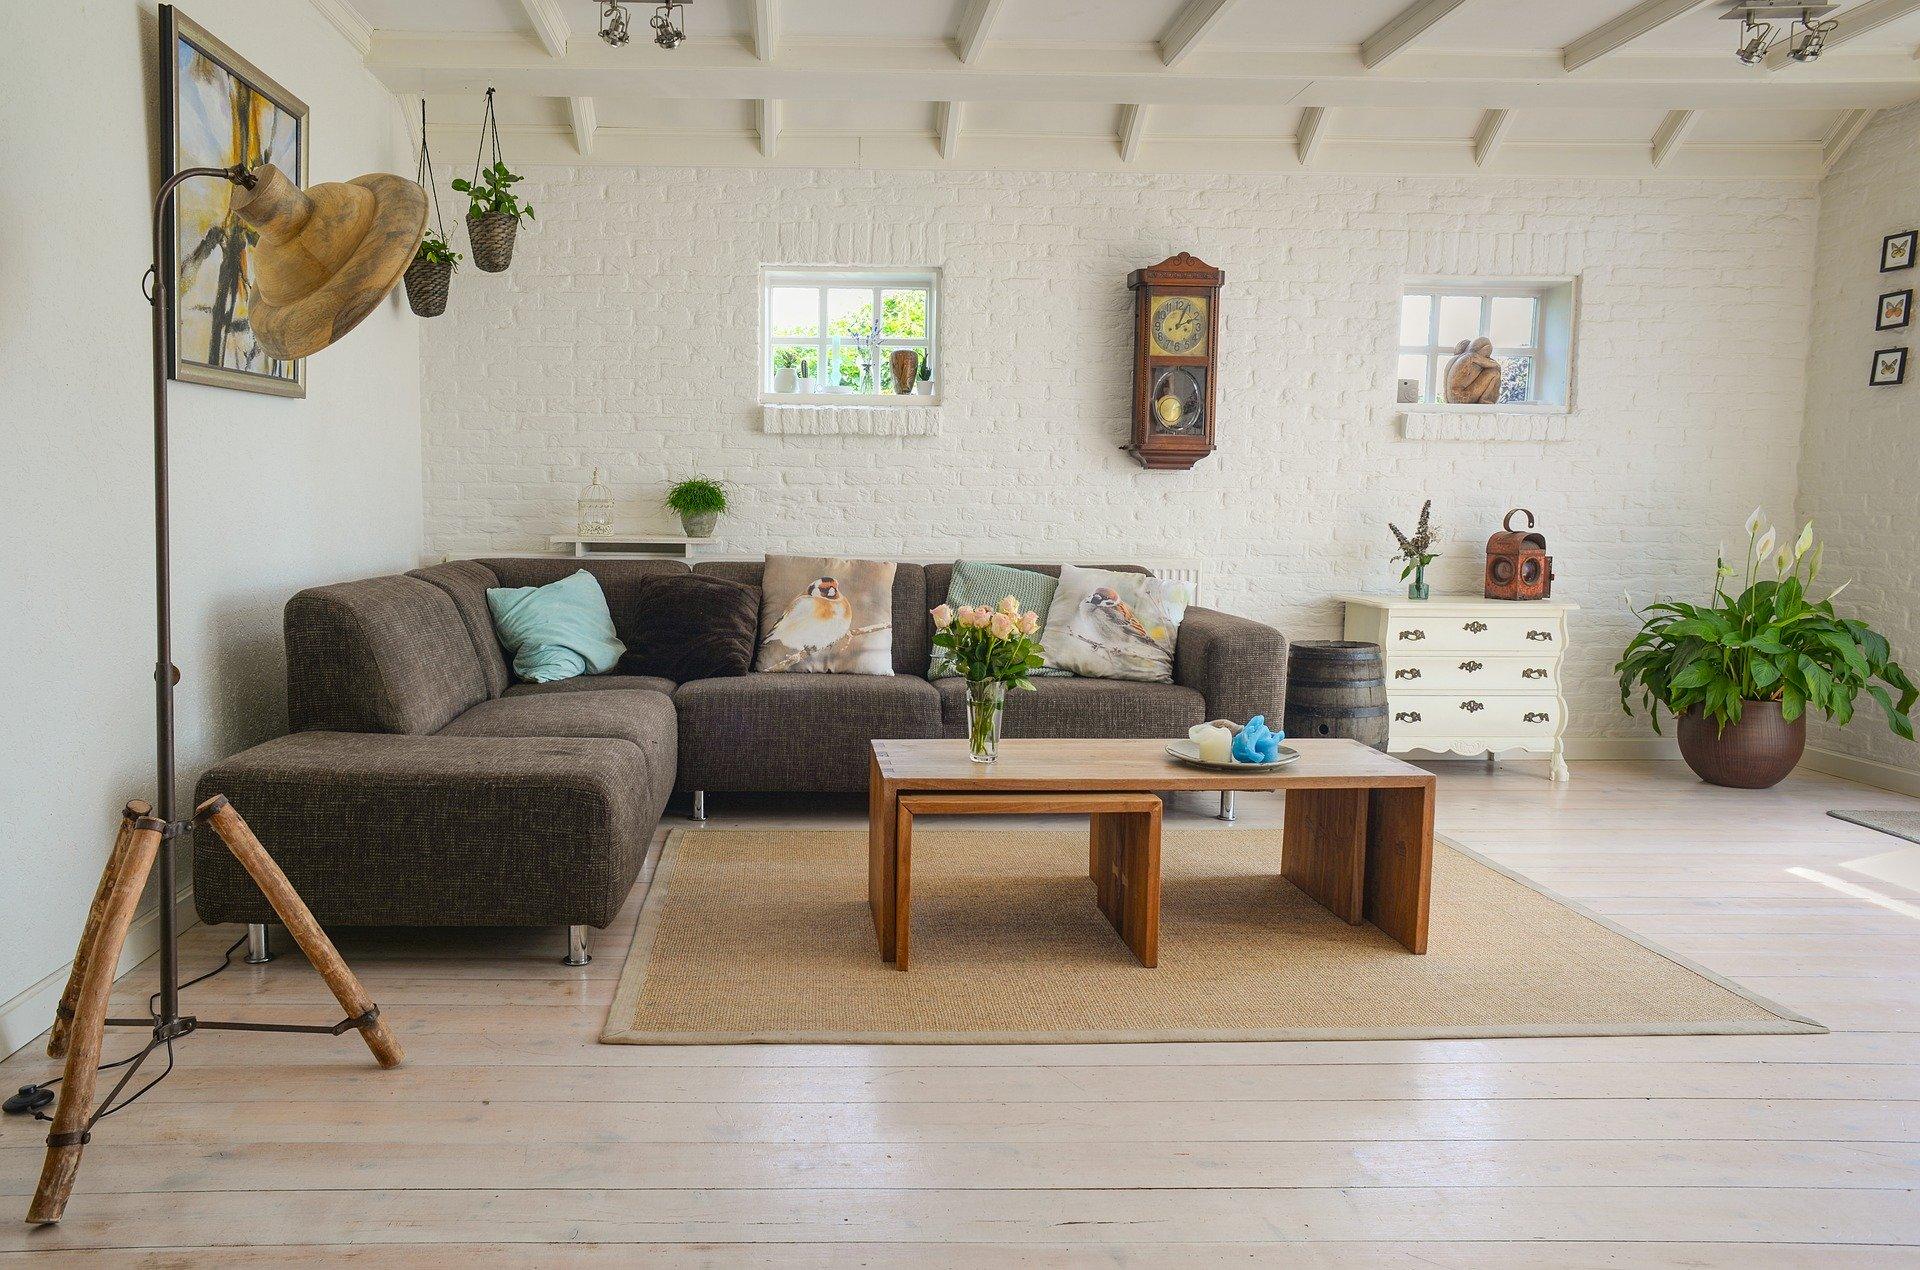 Low budget home decor tips